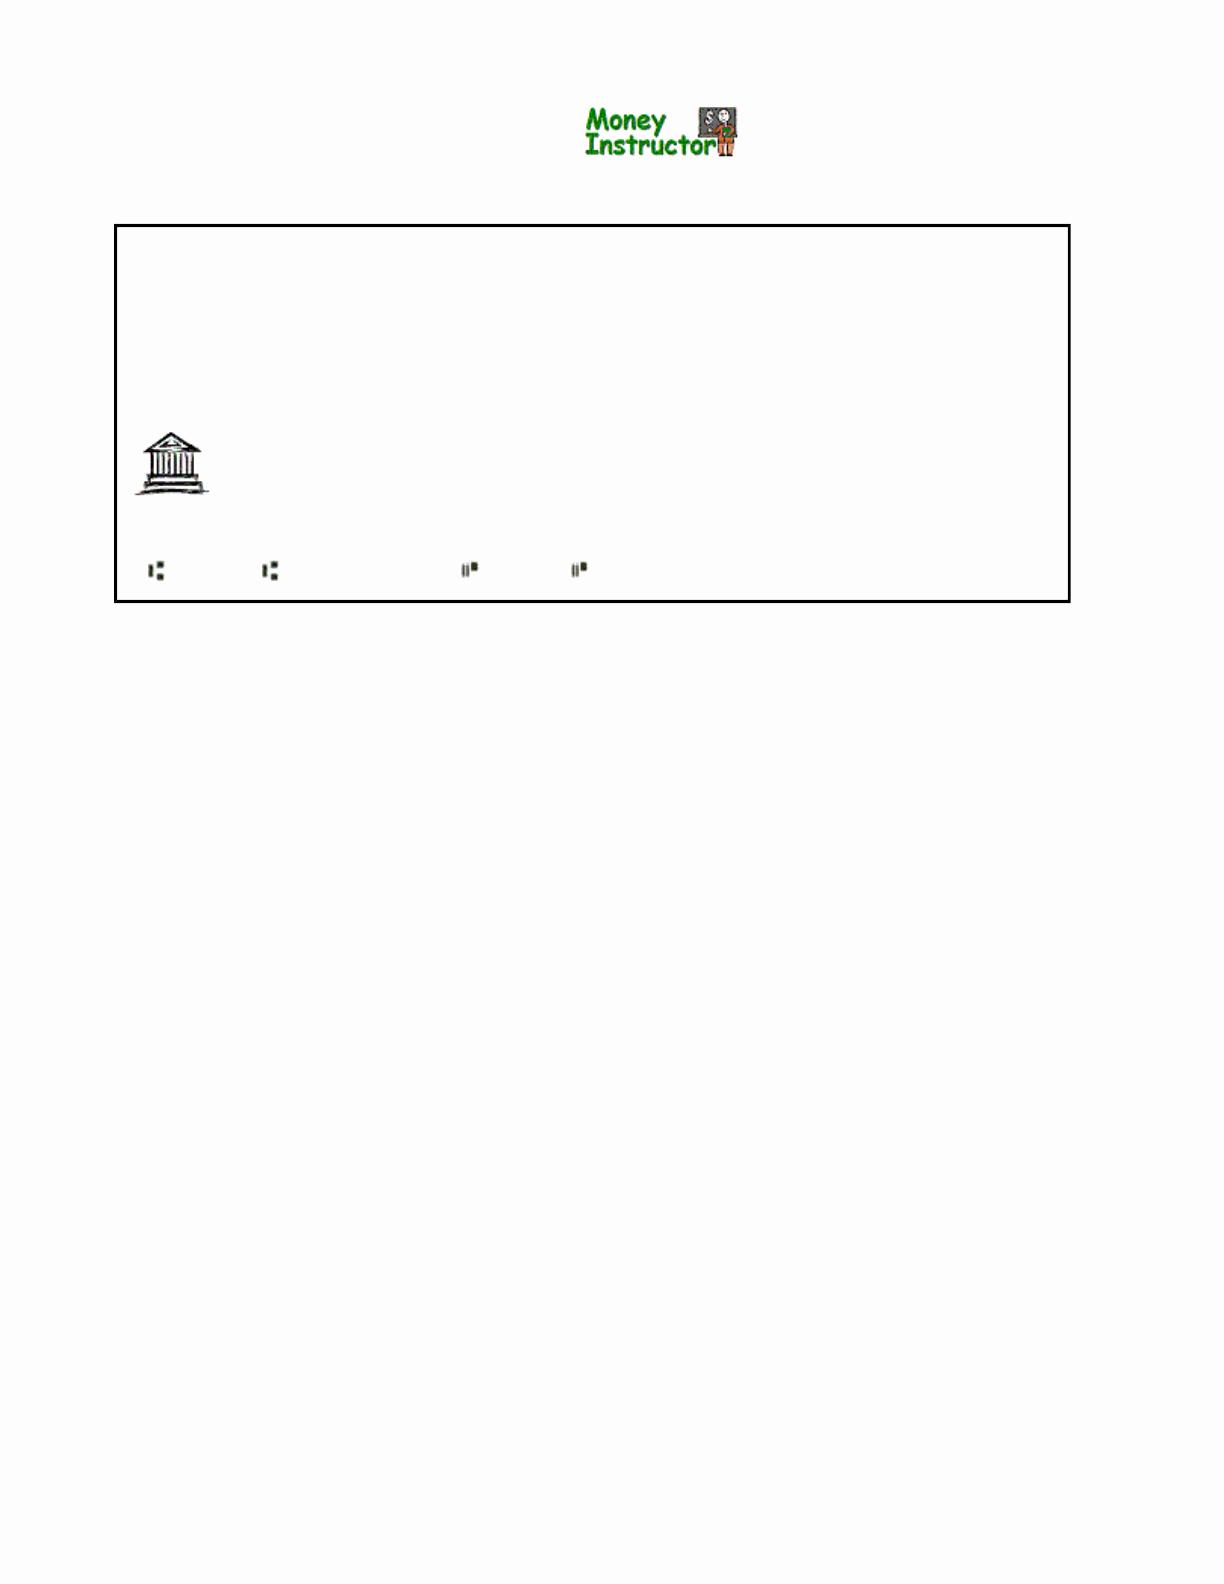 Free Blank Check Template Pdf Elegant Download Printable Blank Check Template Pdf format for